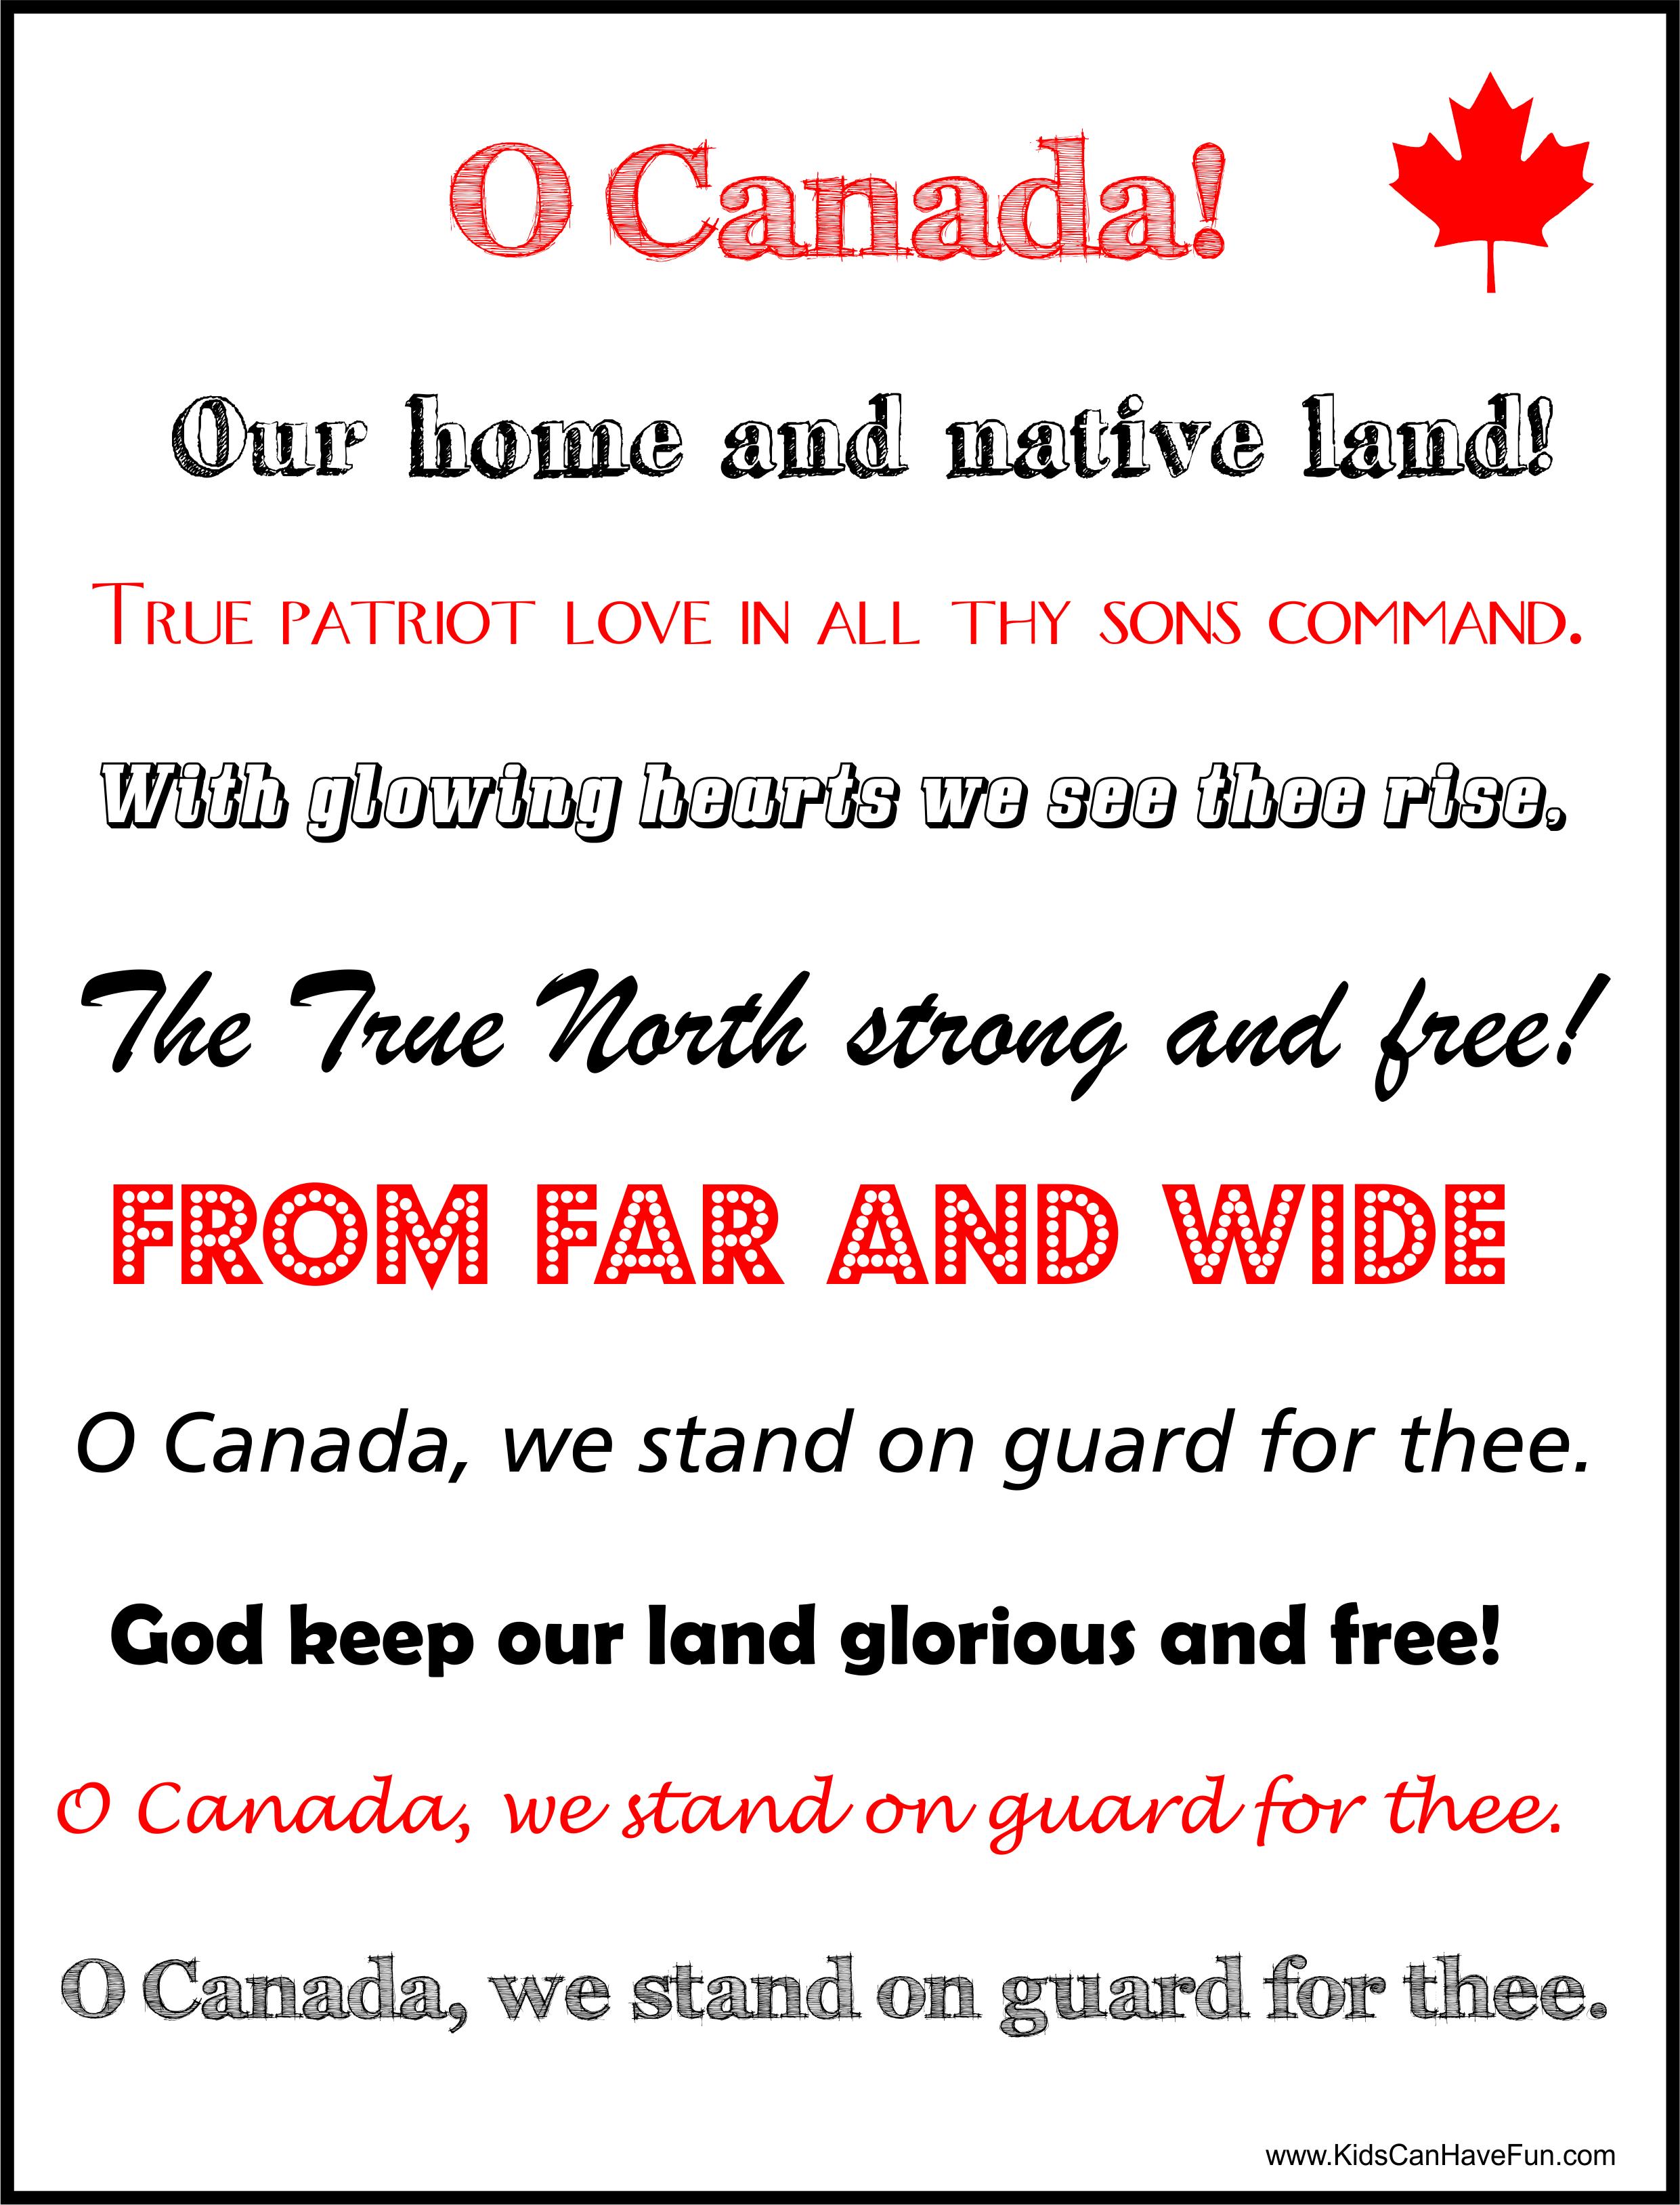 Canada National Anthem Poster Http Www Kidscanhavefun Com Canadaday Activities Htm Ocanada Canadaday Anthem Canada Day Flag Canada Day Day